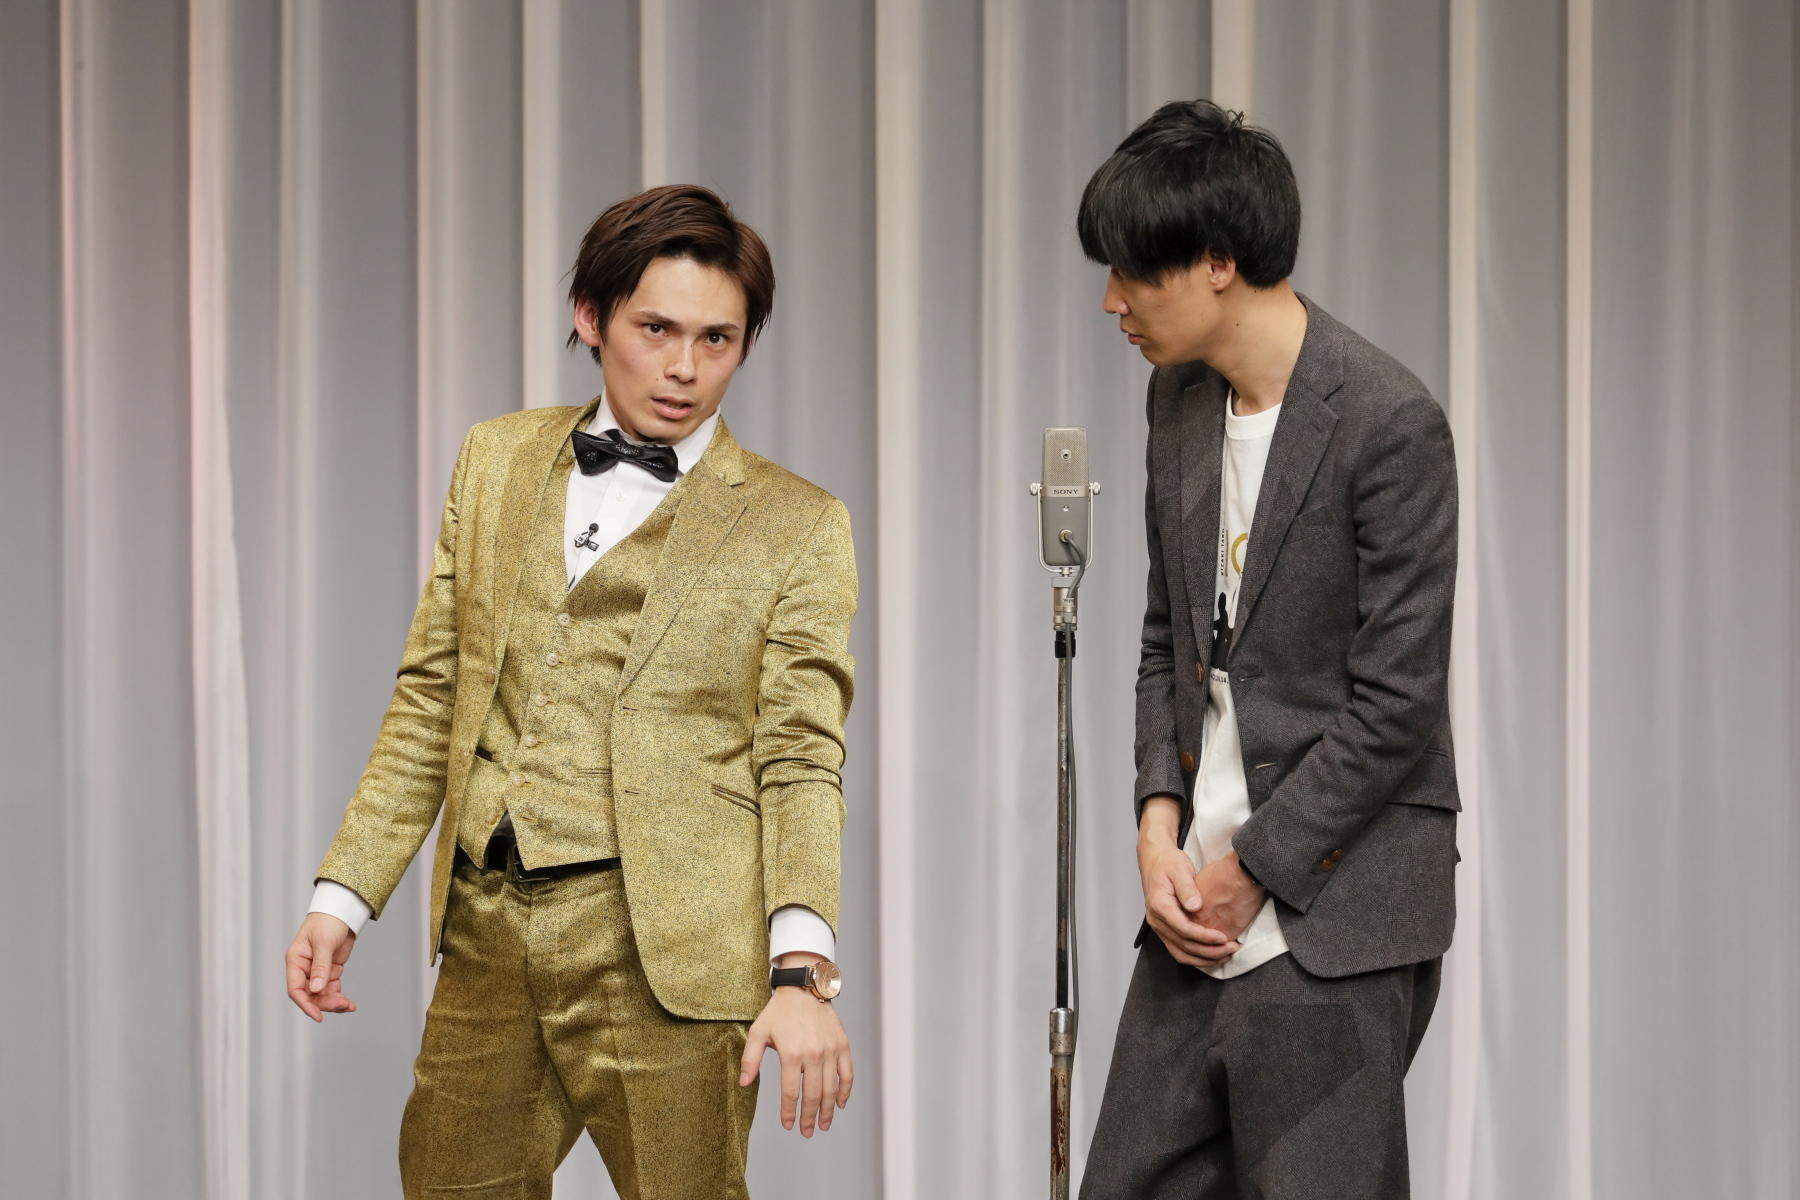 http://news.yoshimoto.co.jp/20181204222758-dba72978a0dffbdd4684c2a1bfe5301e7273fec4.jpg